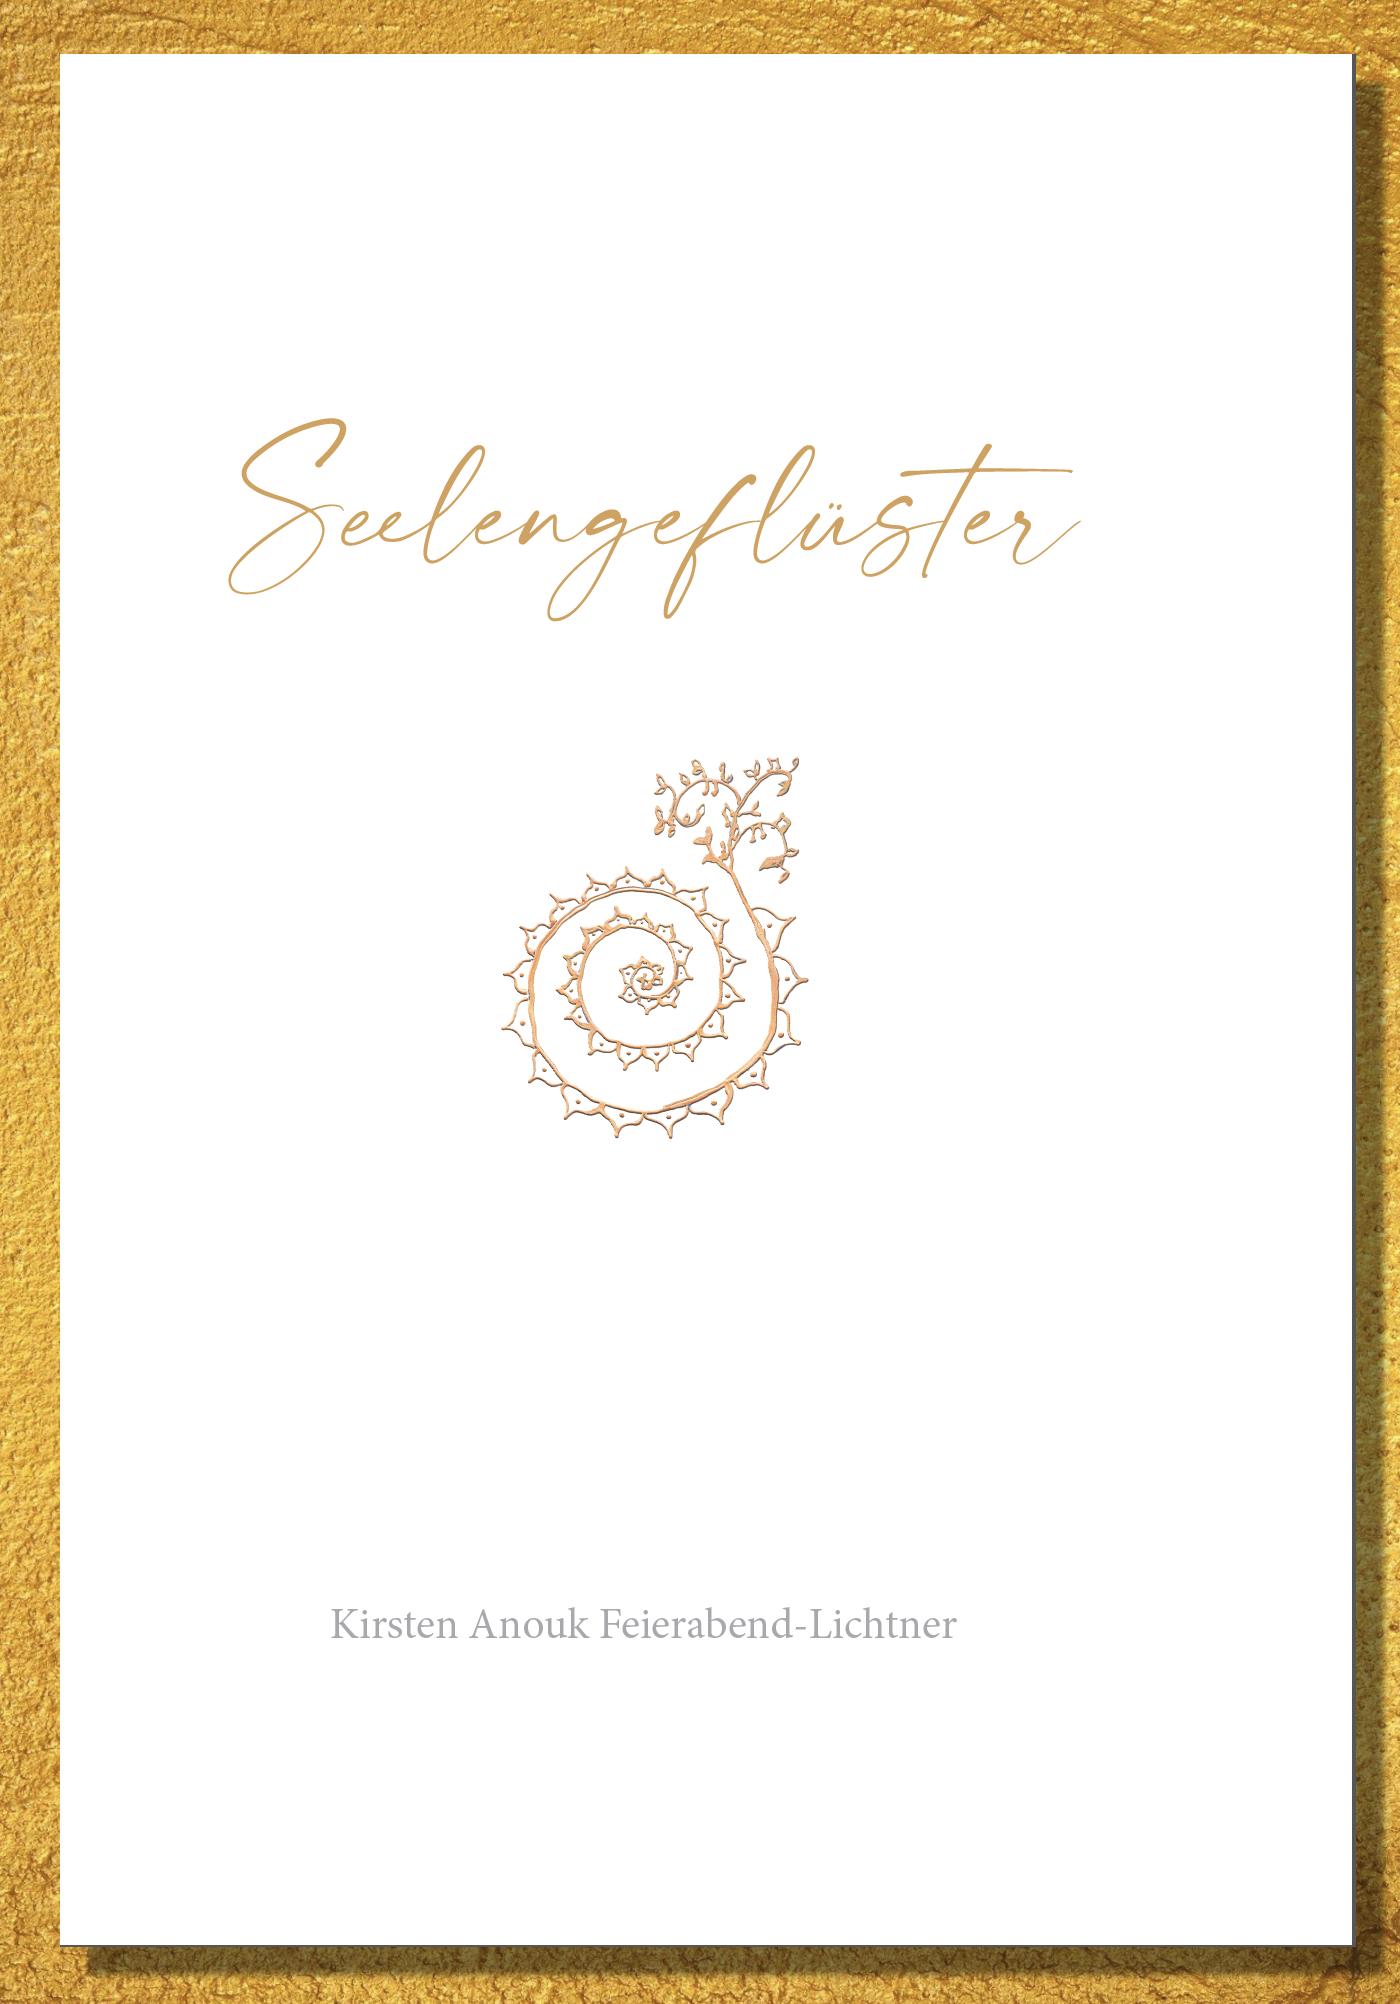 Seelengeflüster - Gedichte